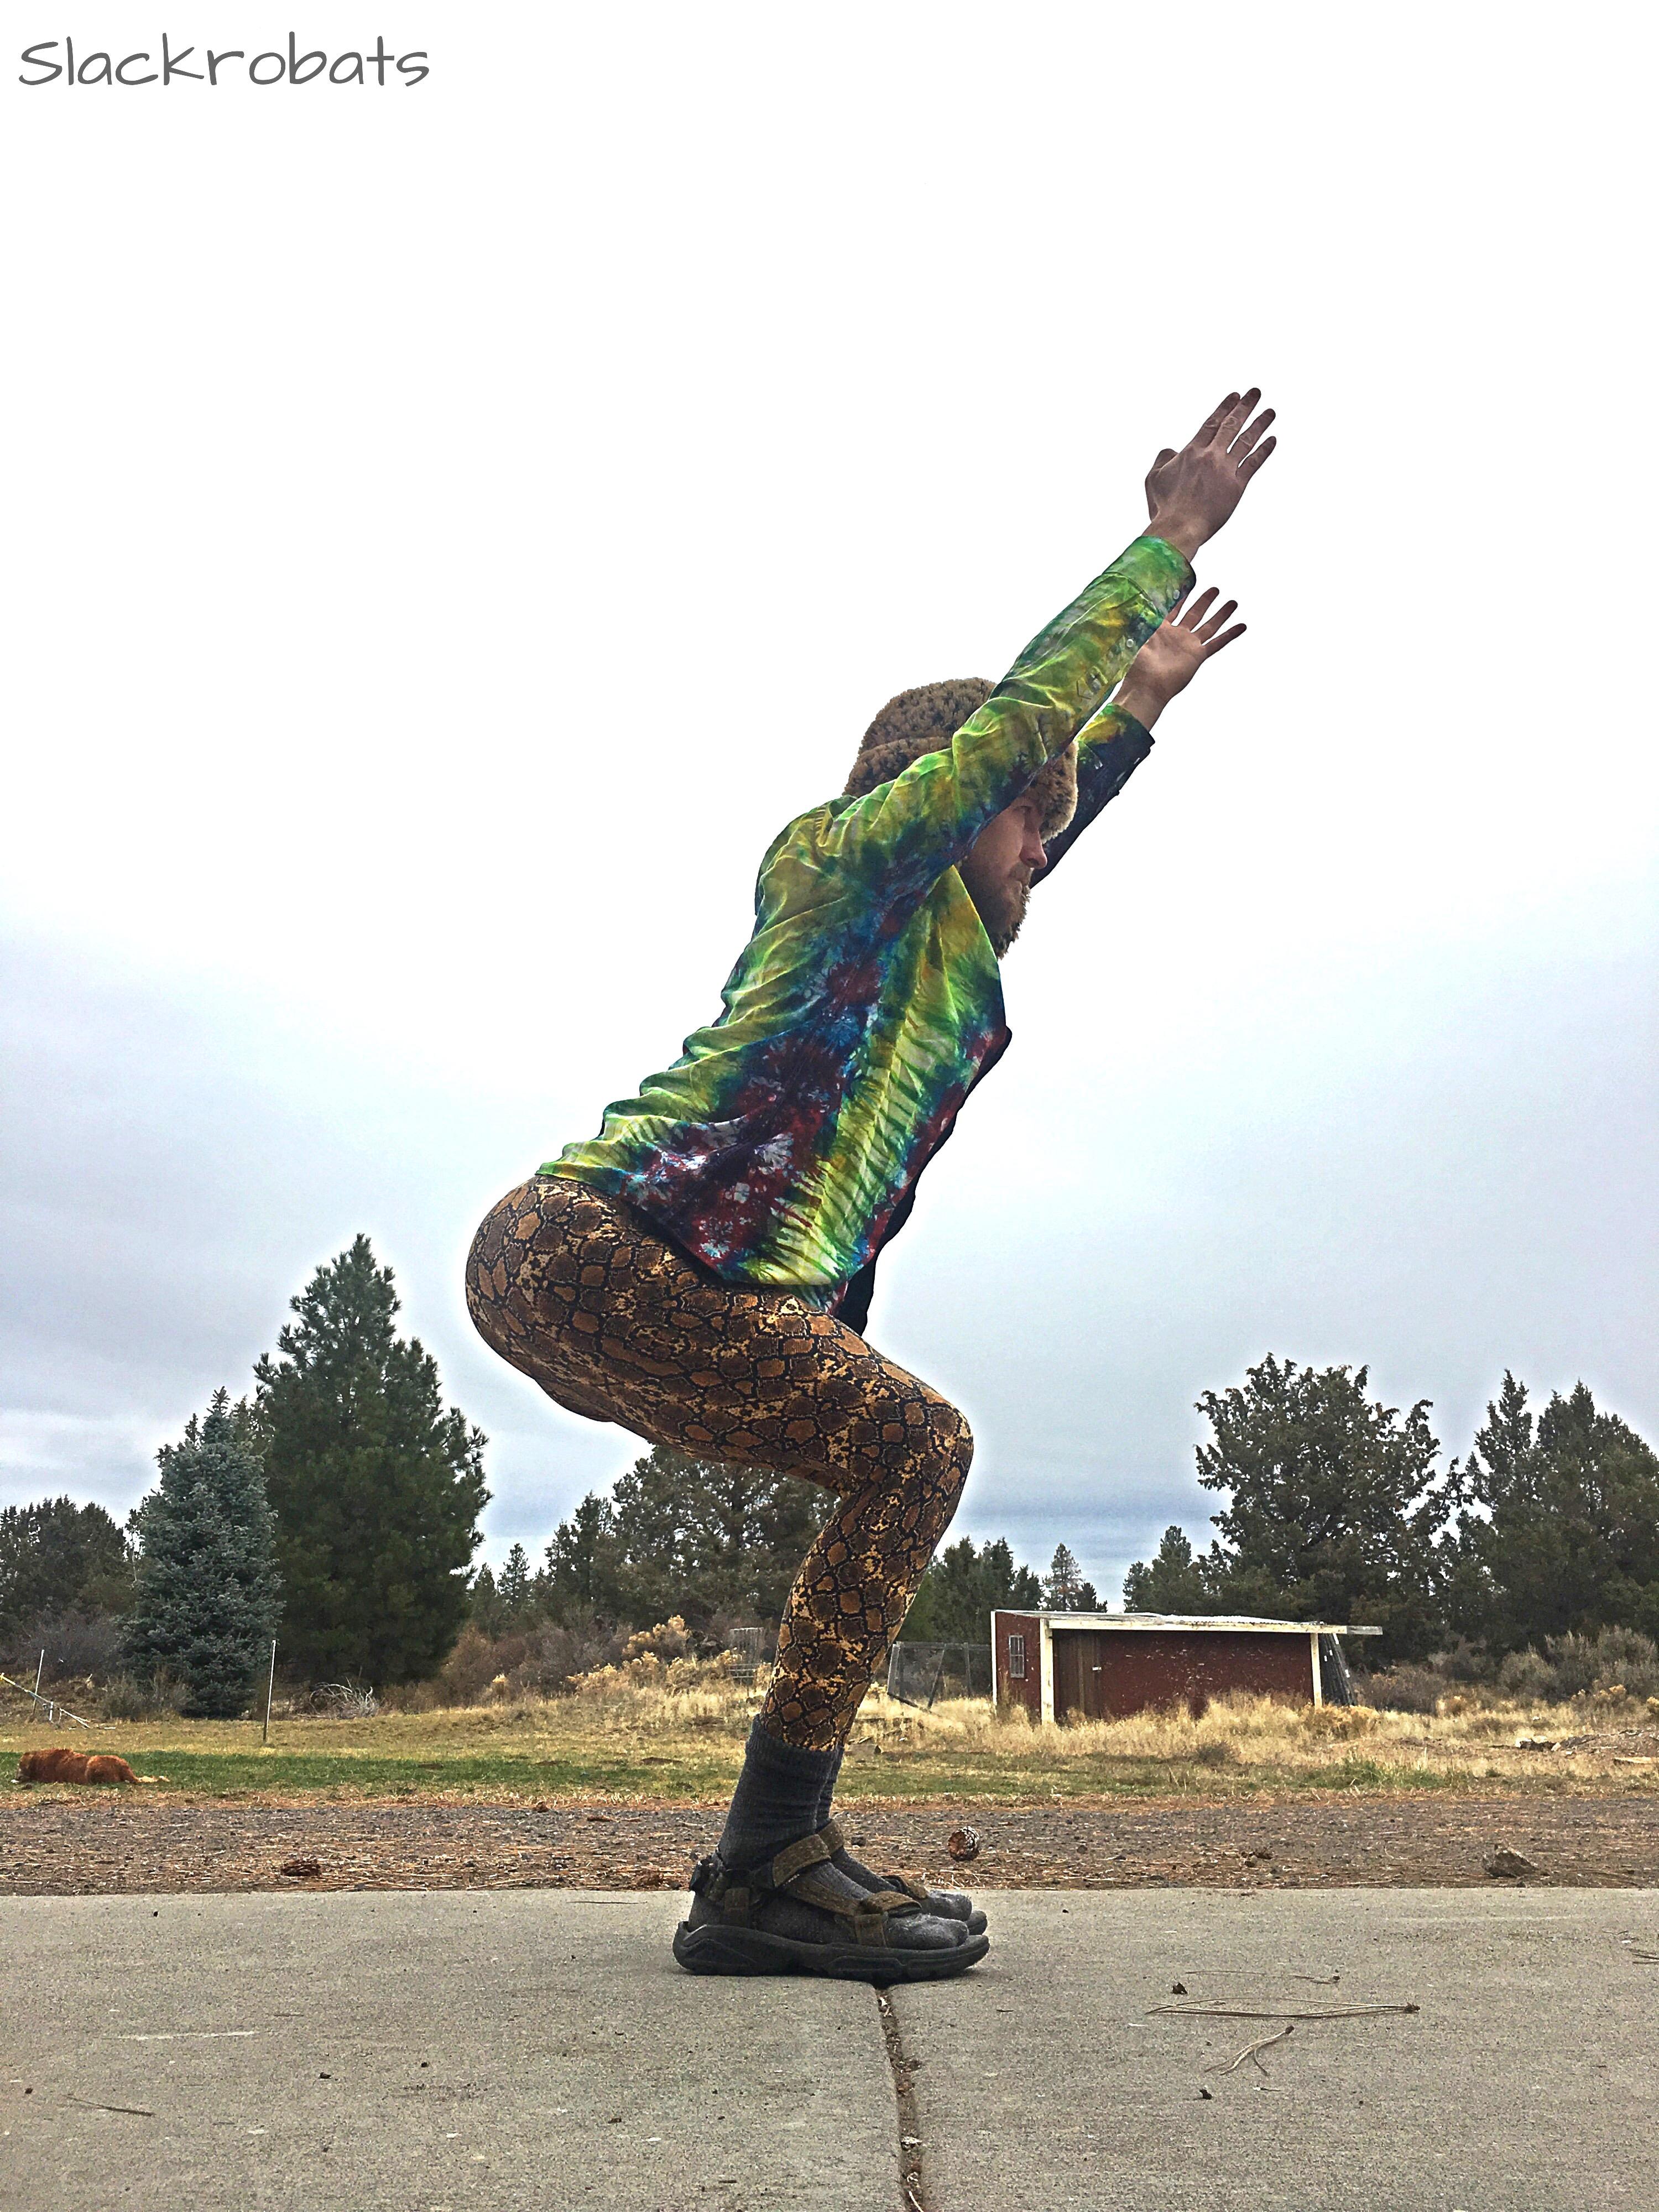 Slackrobats AcroYoga Warm-Ups 6 Leg Warm-Ups For Bases